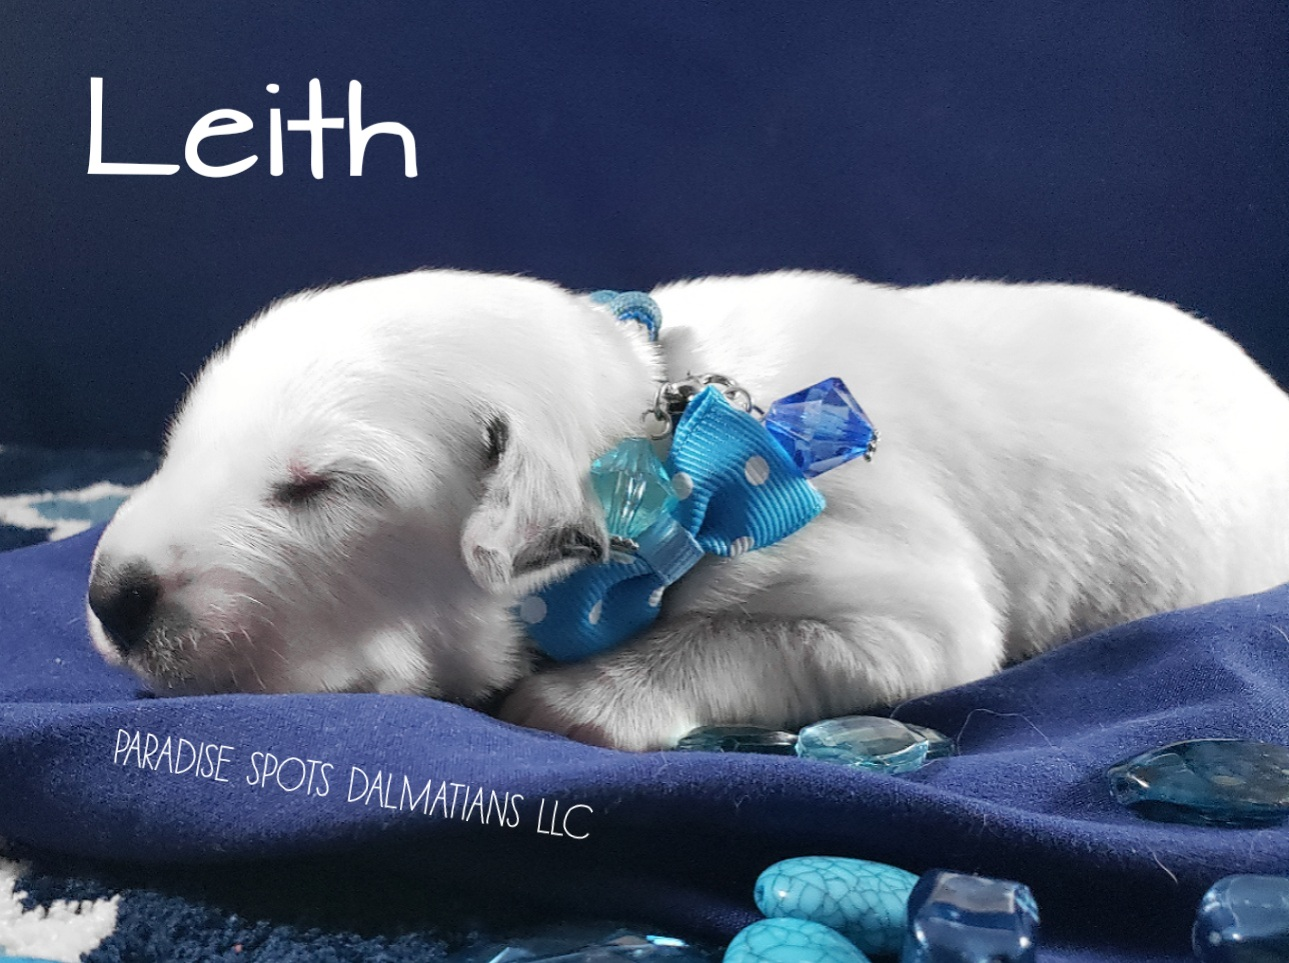 Leith-1w (5)